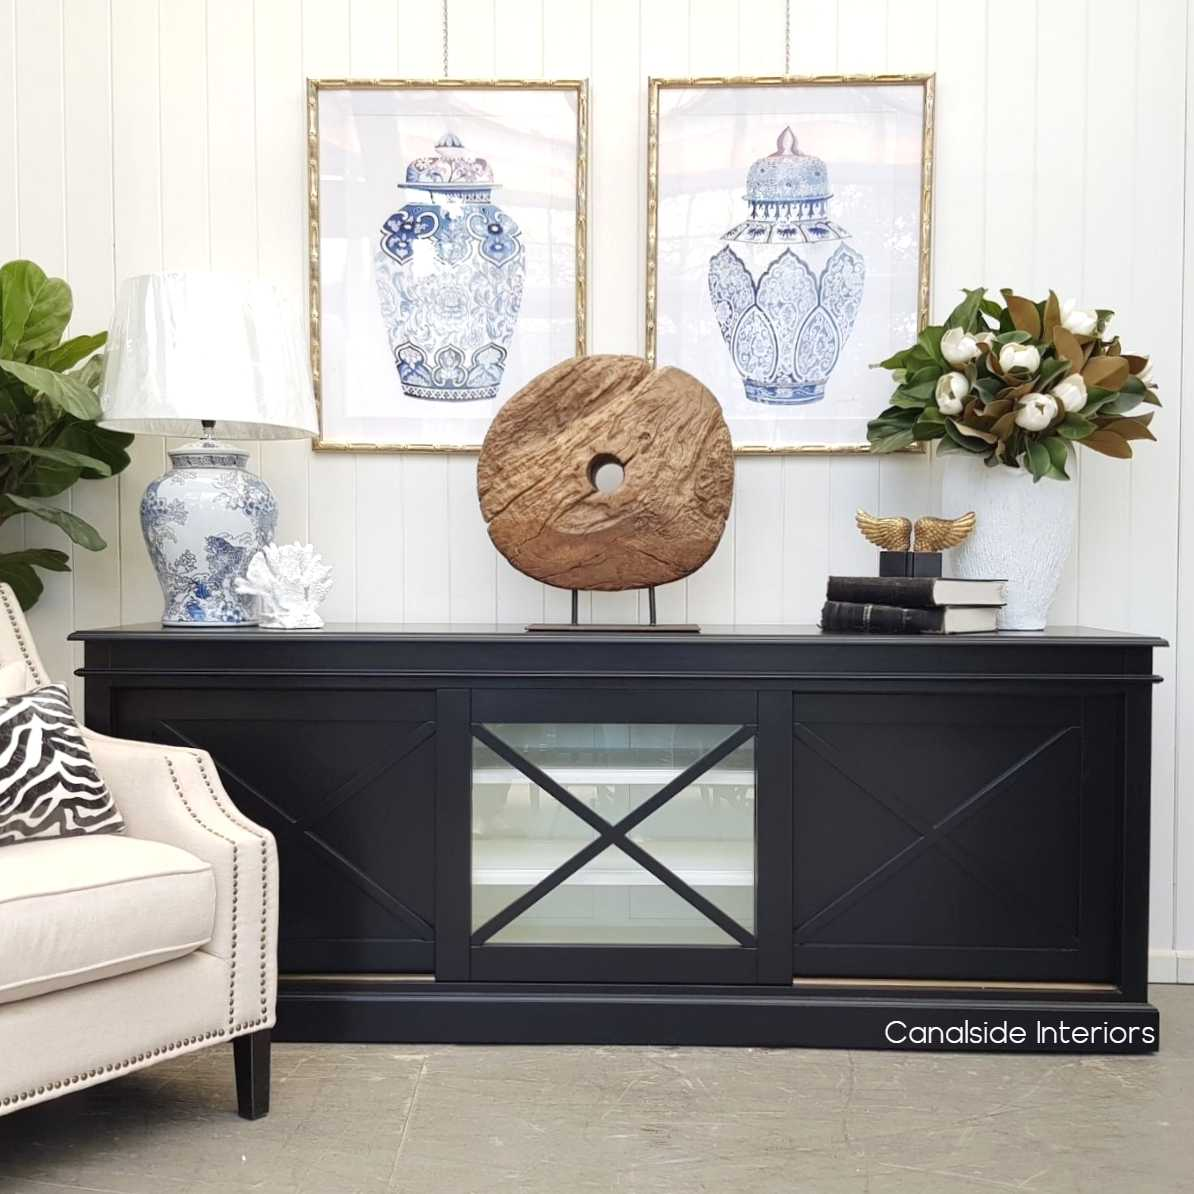 Belmont Hamptons Sliding Door TV Sideboard Black with White Interior  HAMPTONS Style, PLANTATION Style, LIVING Room, LIVING TV Media & Storage, TABLES Sideboards & Buffets, STORAGE, STORAGE Sideboards & Buffets